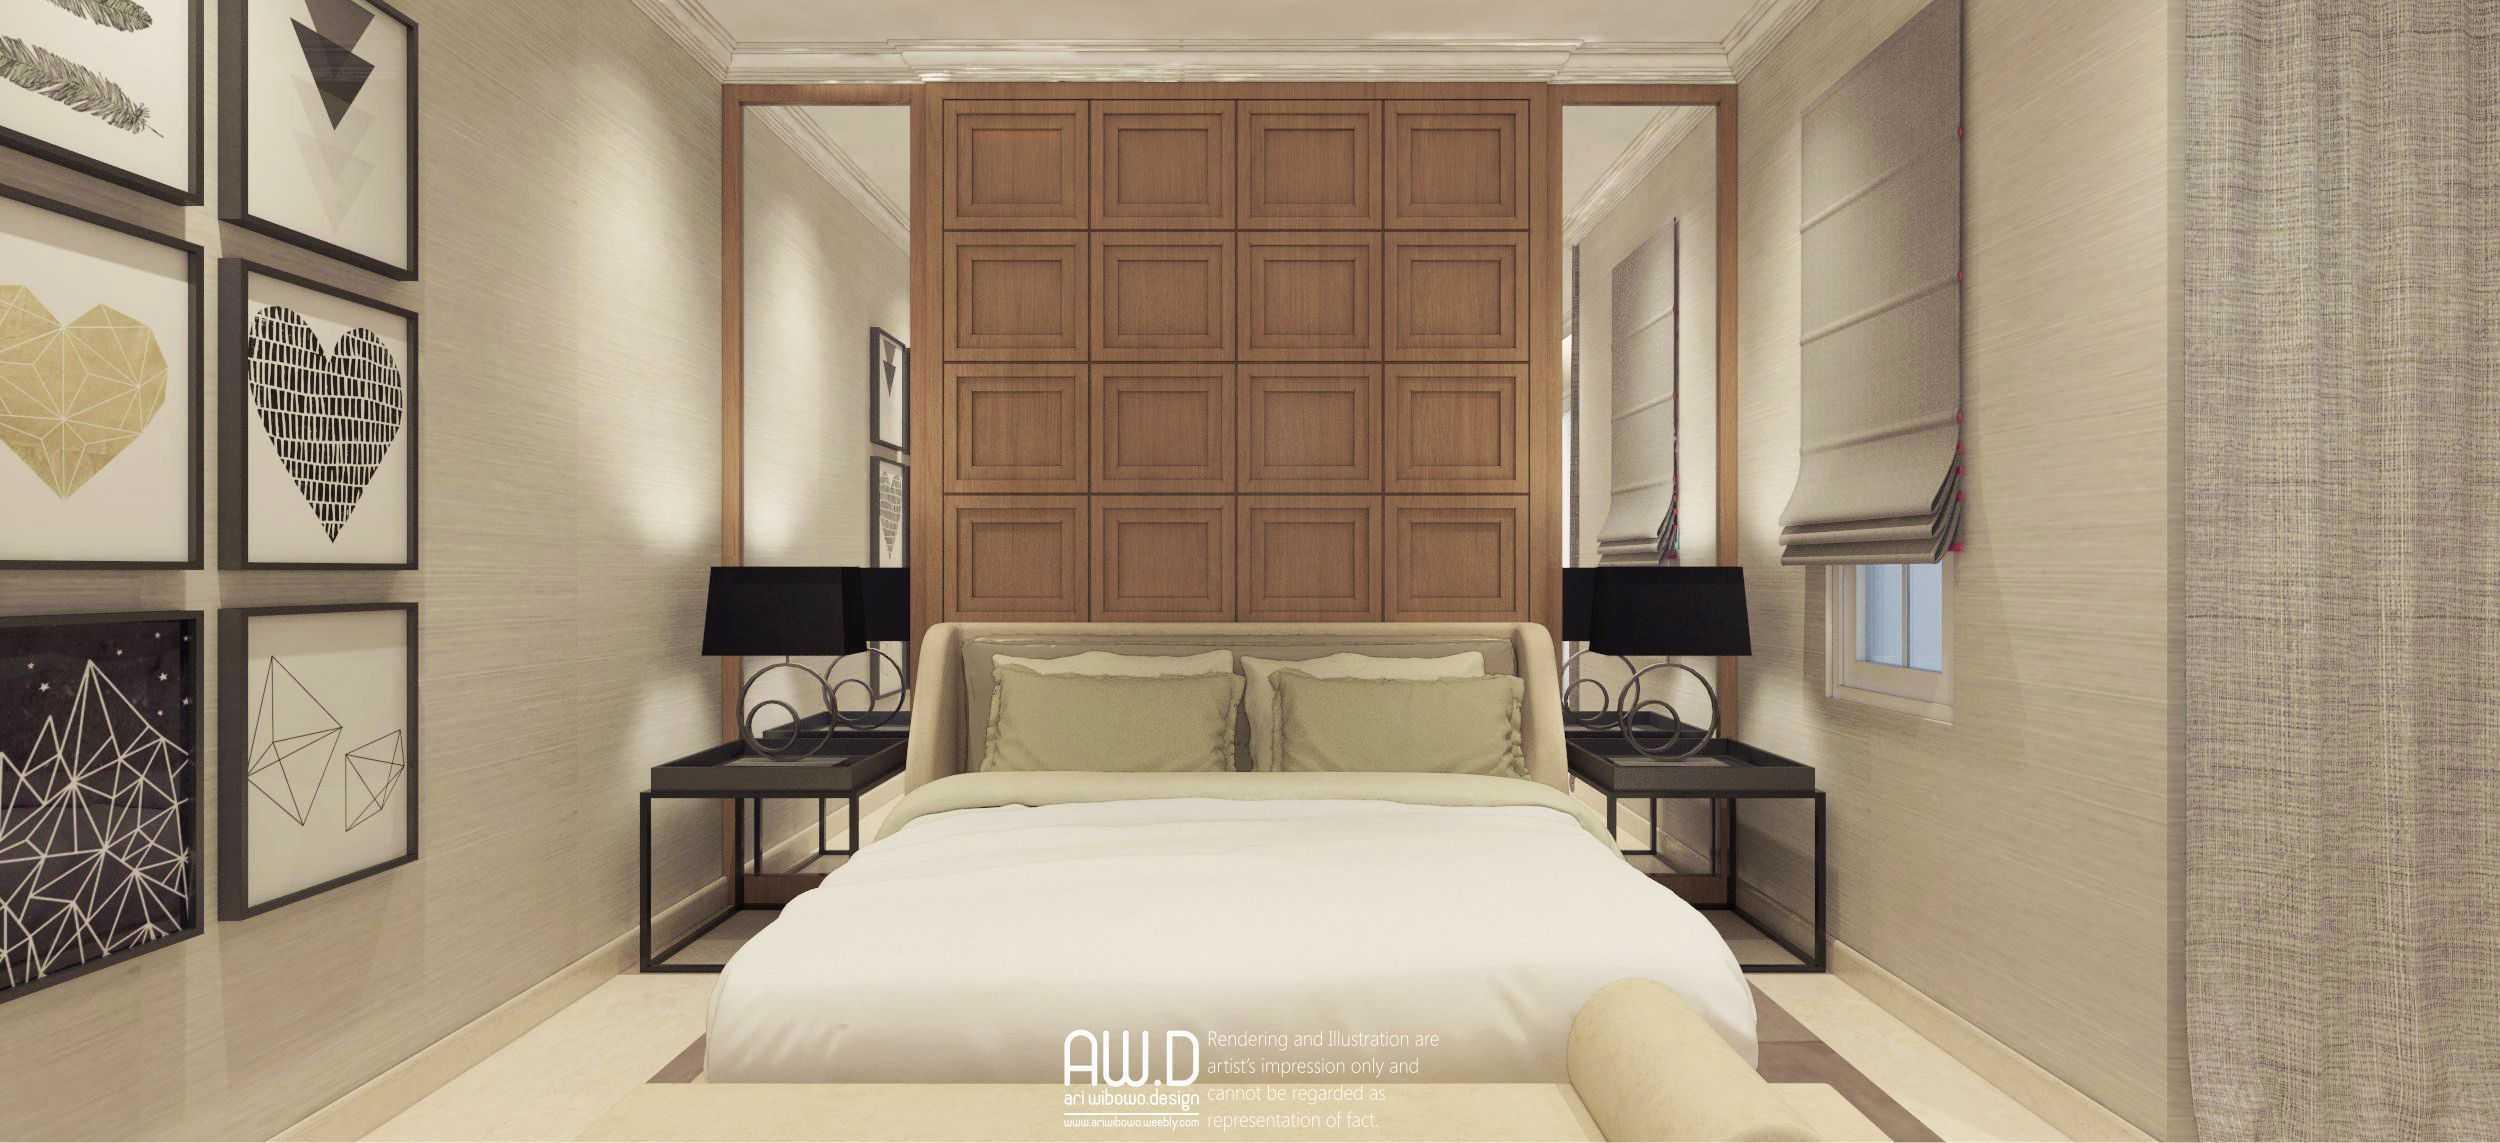 Ari Wibowo Design (Aw.d) Hw House Makassar Makassar Bedroom Klasik,modern  19872